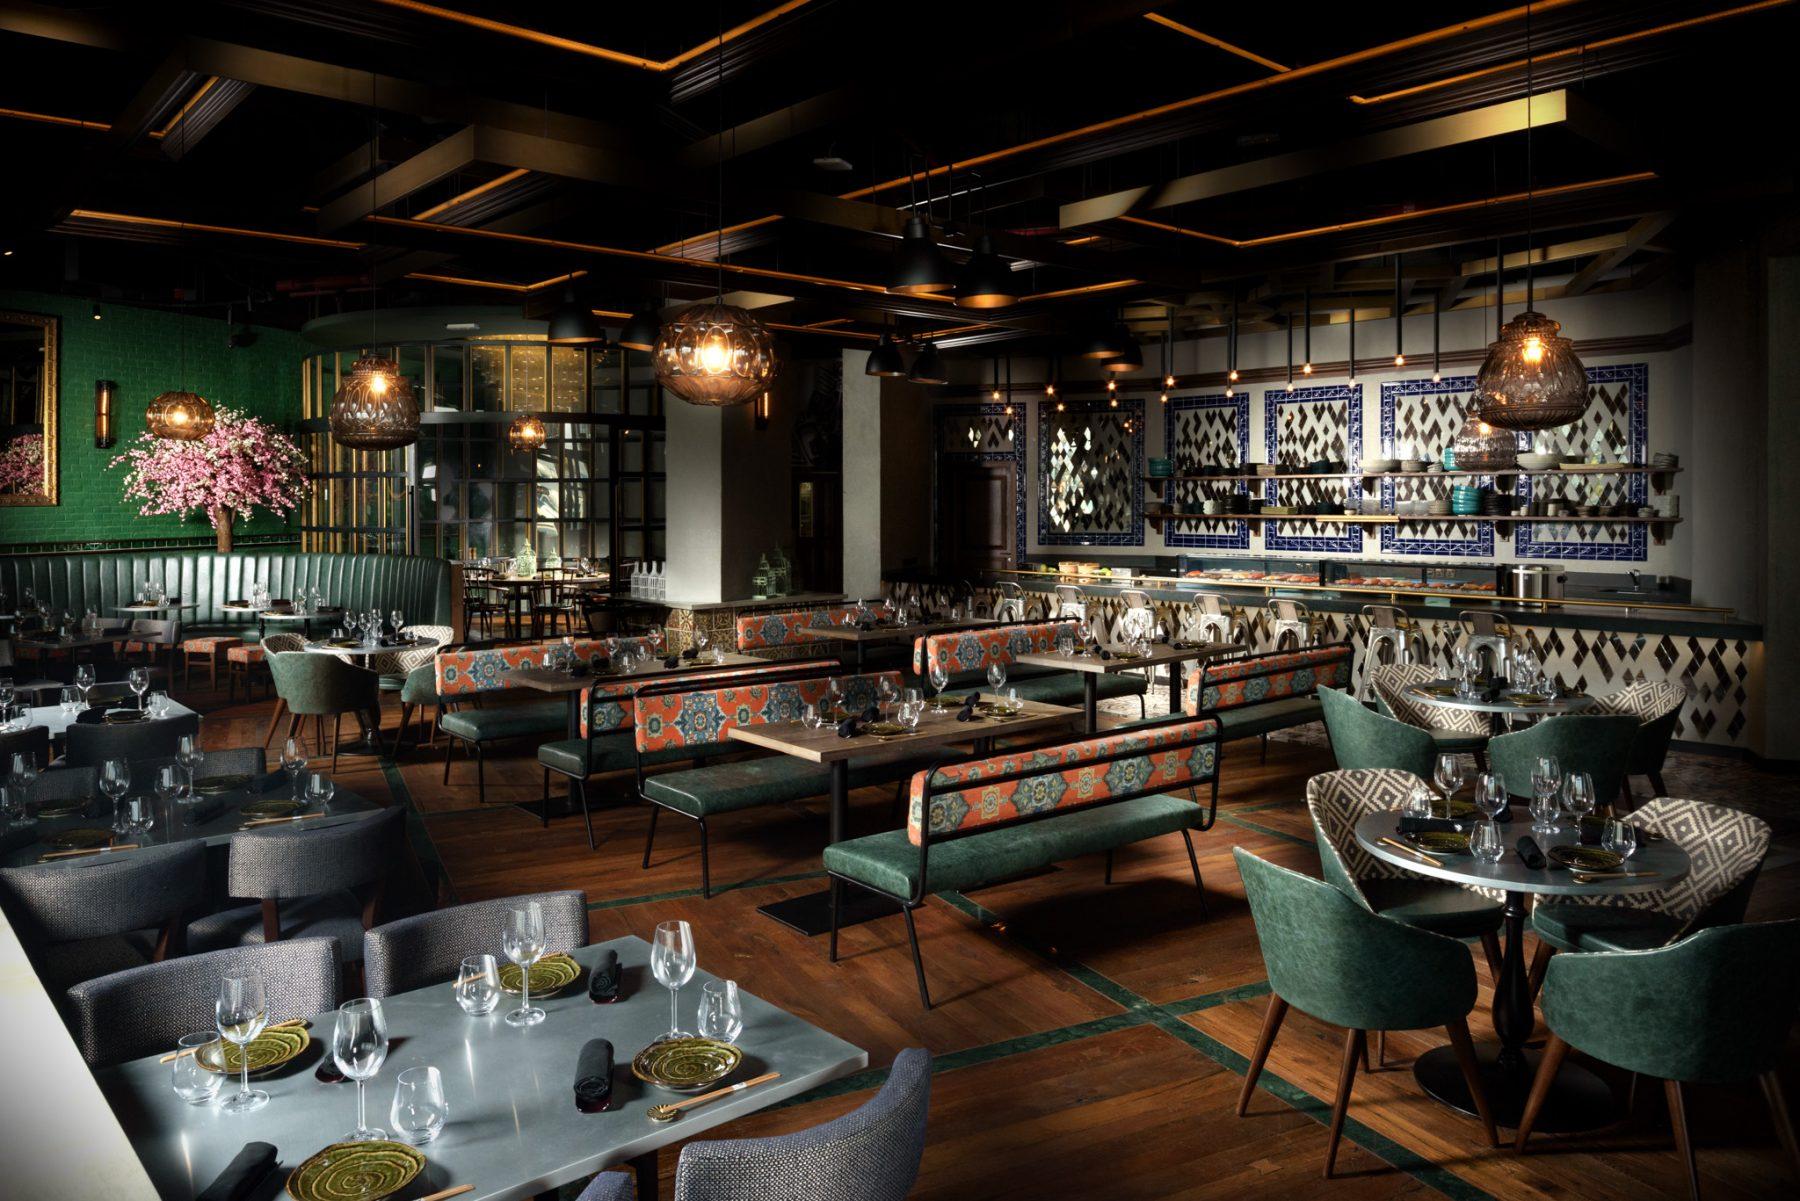 AJI restaurant in Dubai